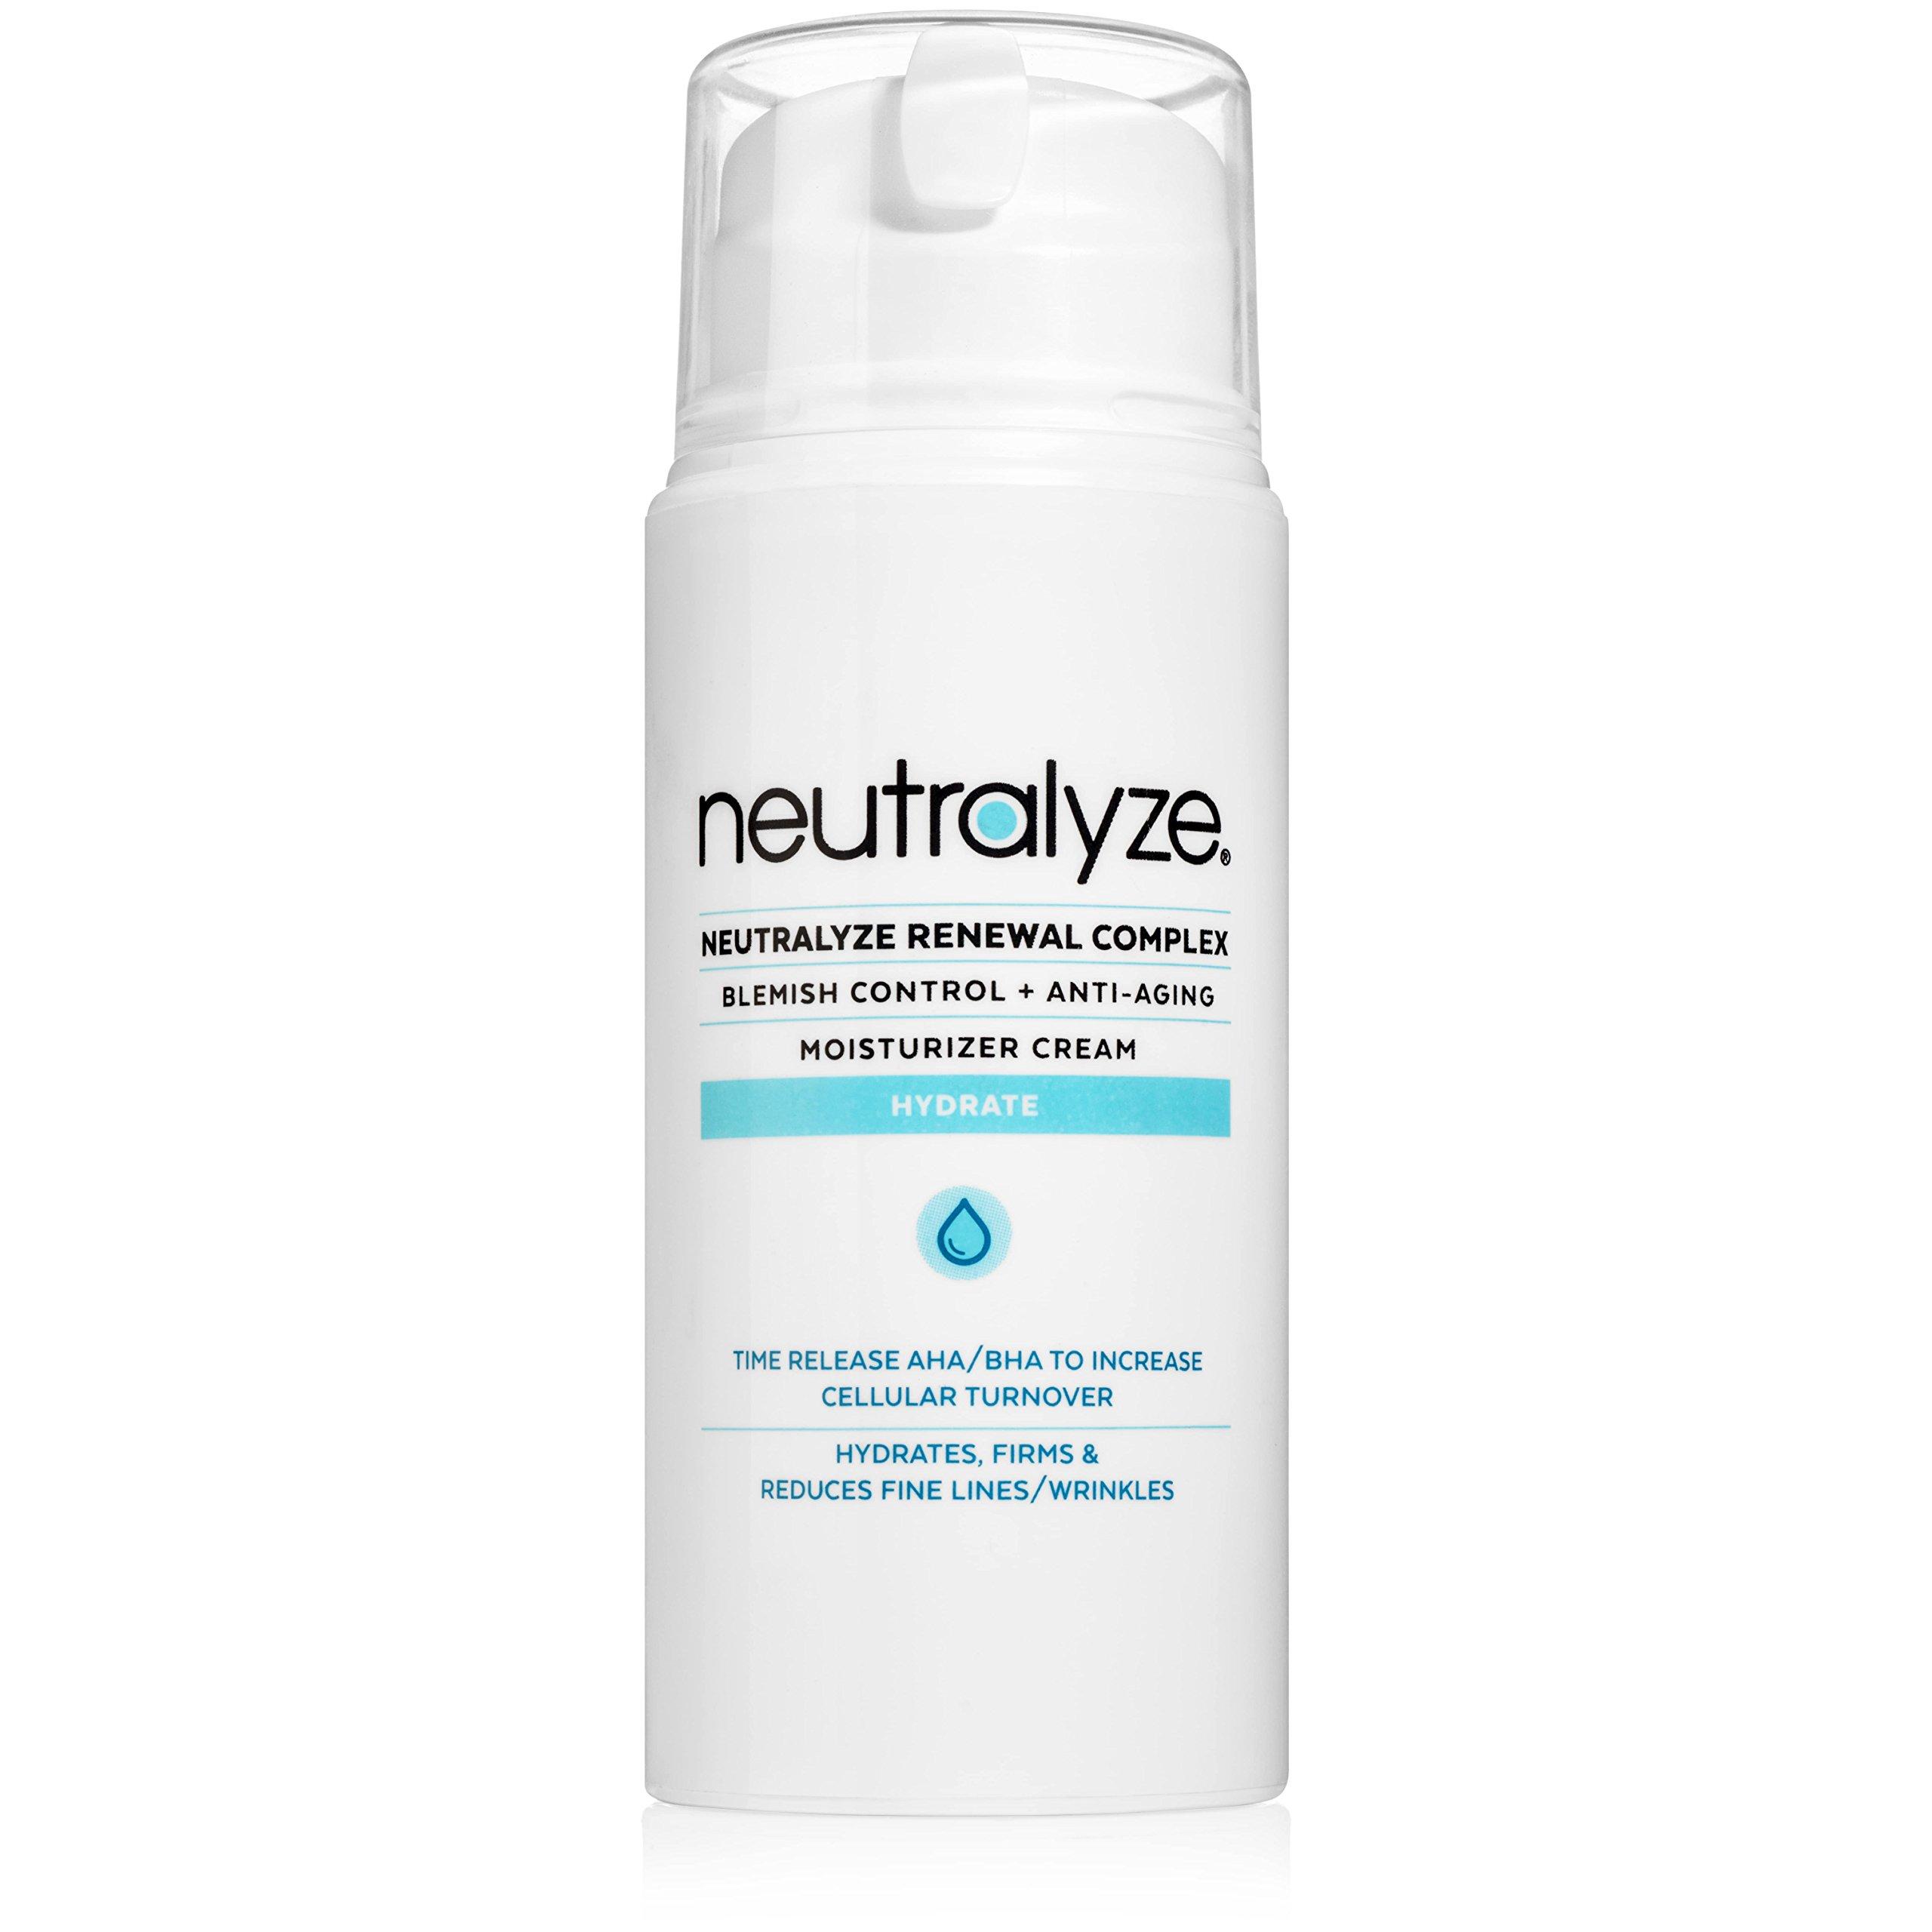 Neutralyze Renewal Complex (3.4 oz) - Maximum Strength Anti Acne + Anti Aging Moisturizer Cream With Time-Released 2% Salicylic Acid + 1% Mandelic Acid + Nitrogen Boost Skincare Technology by Neutralyze Anti-Acne Solution